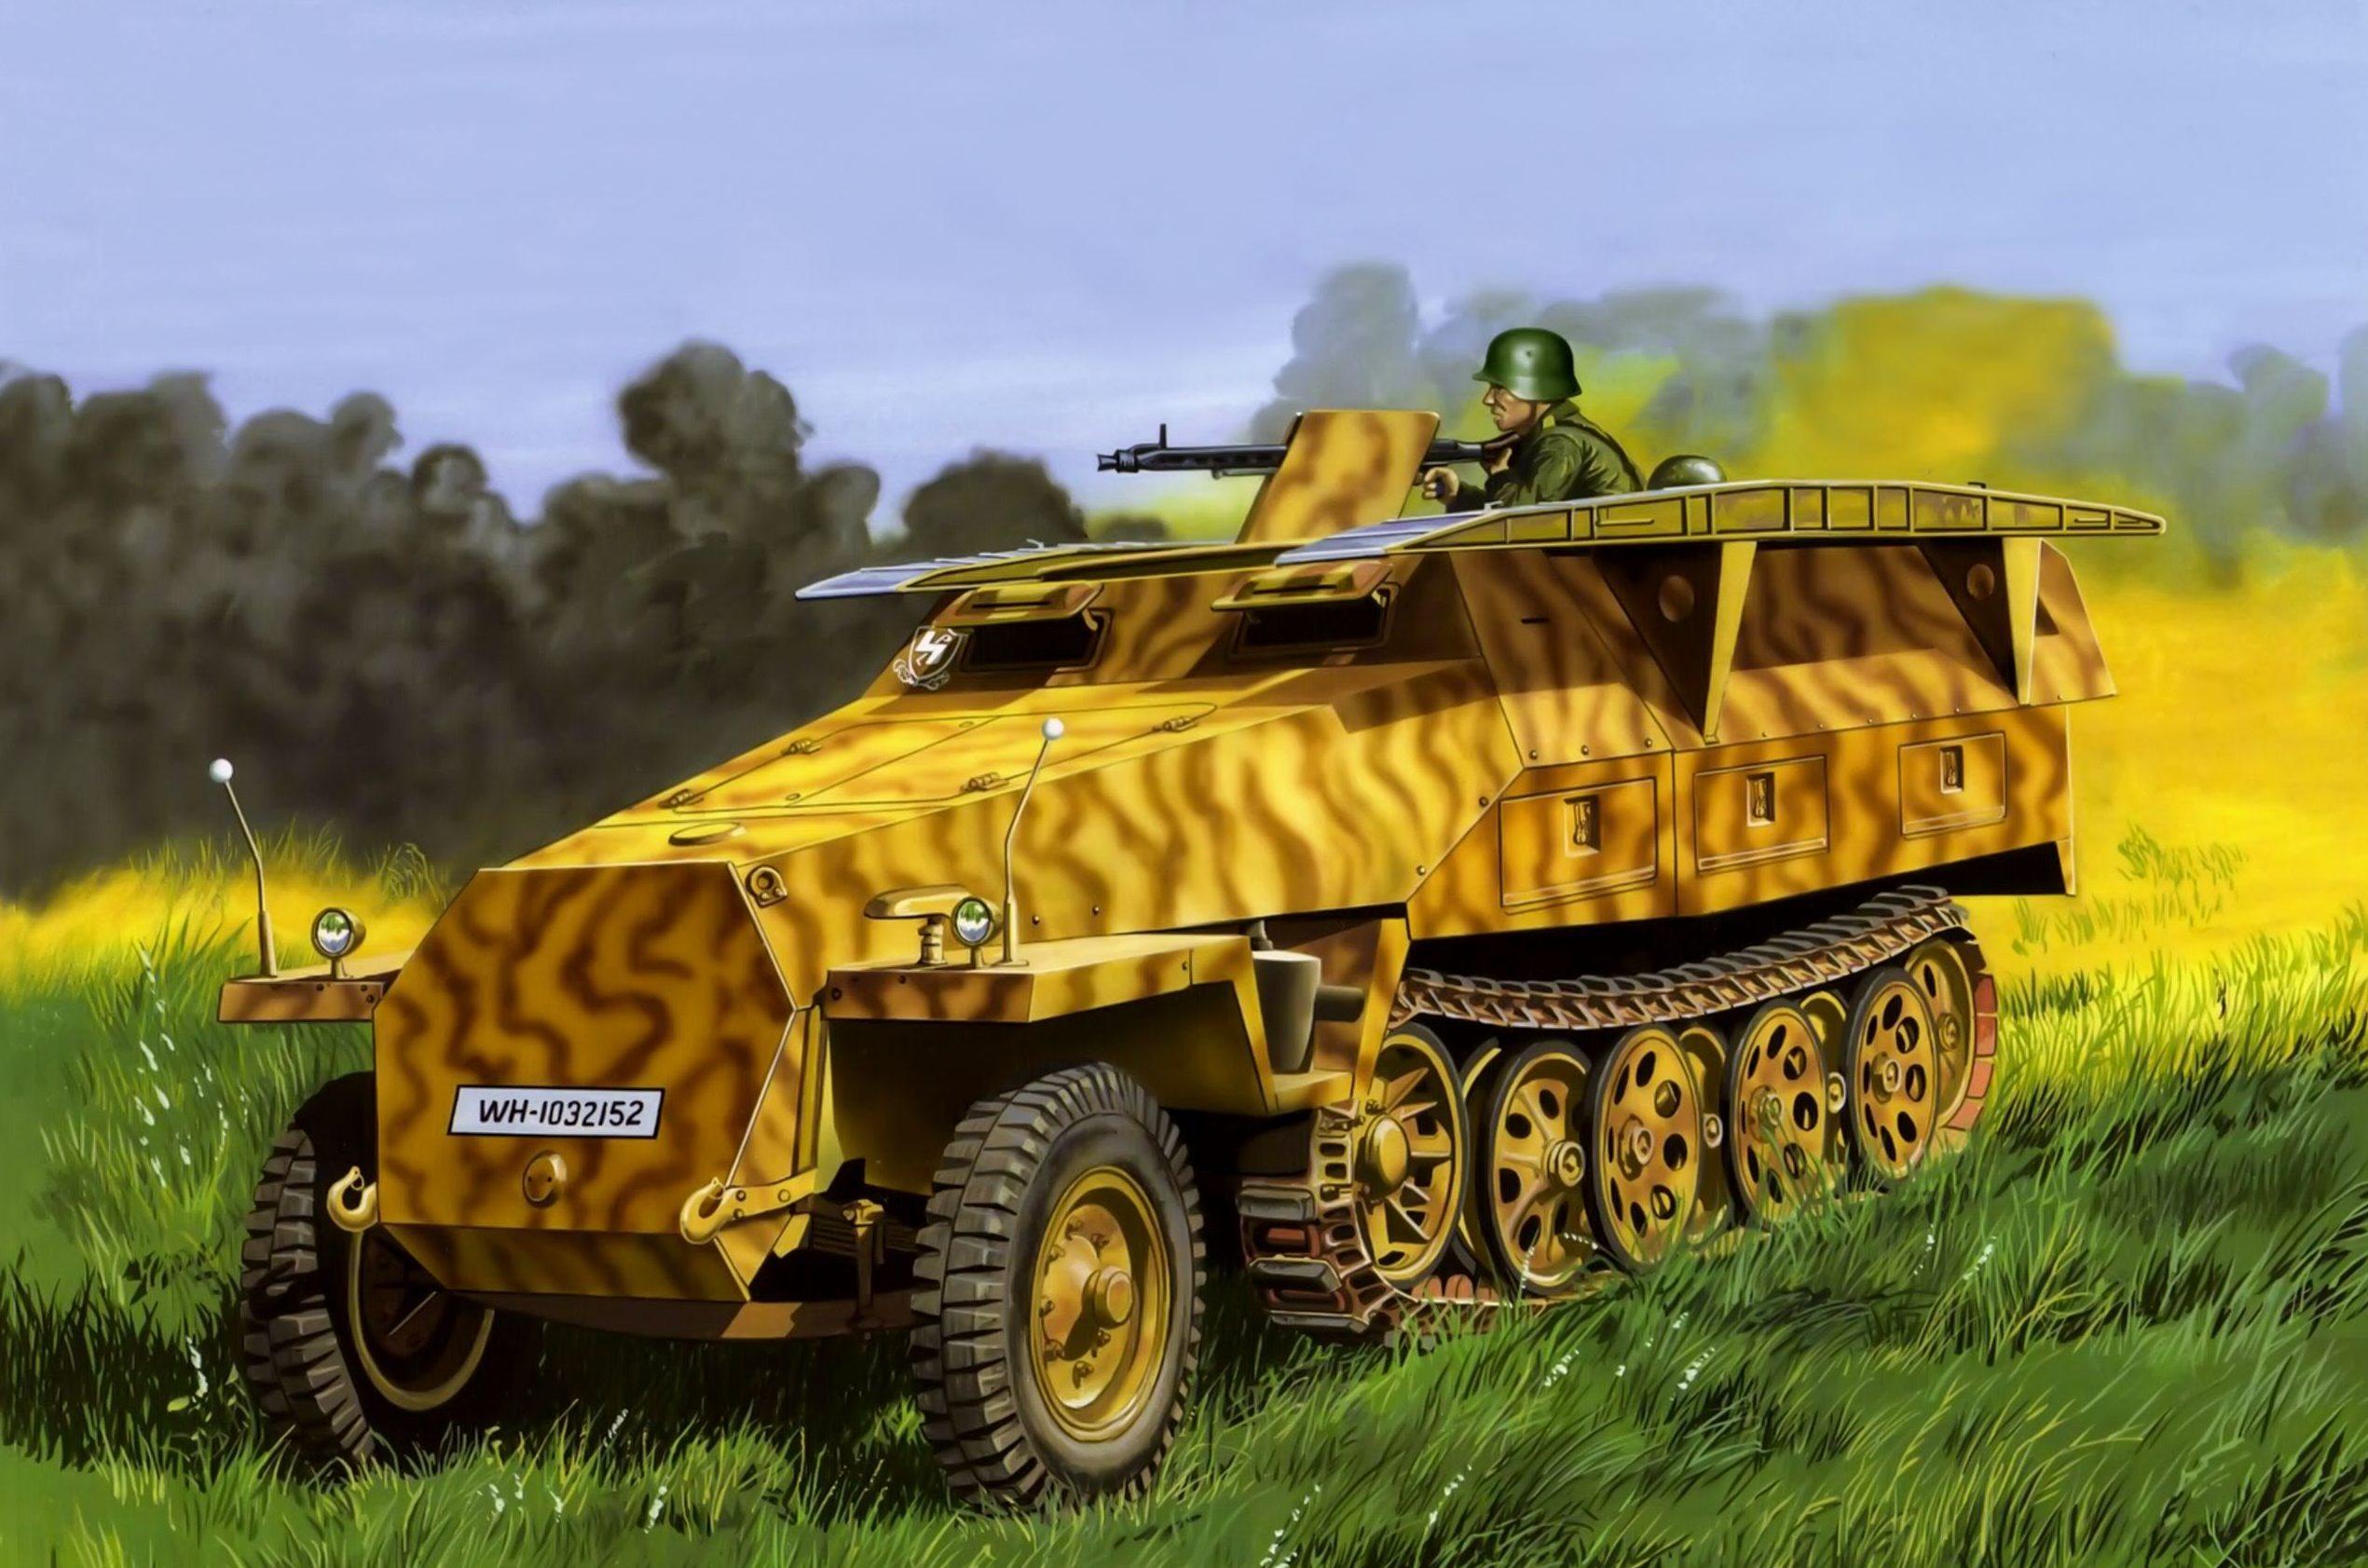 Greer Don. Бронеавтомобиль Sd.kfz. 251.